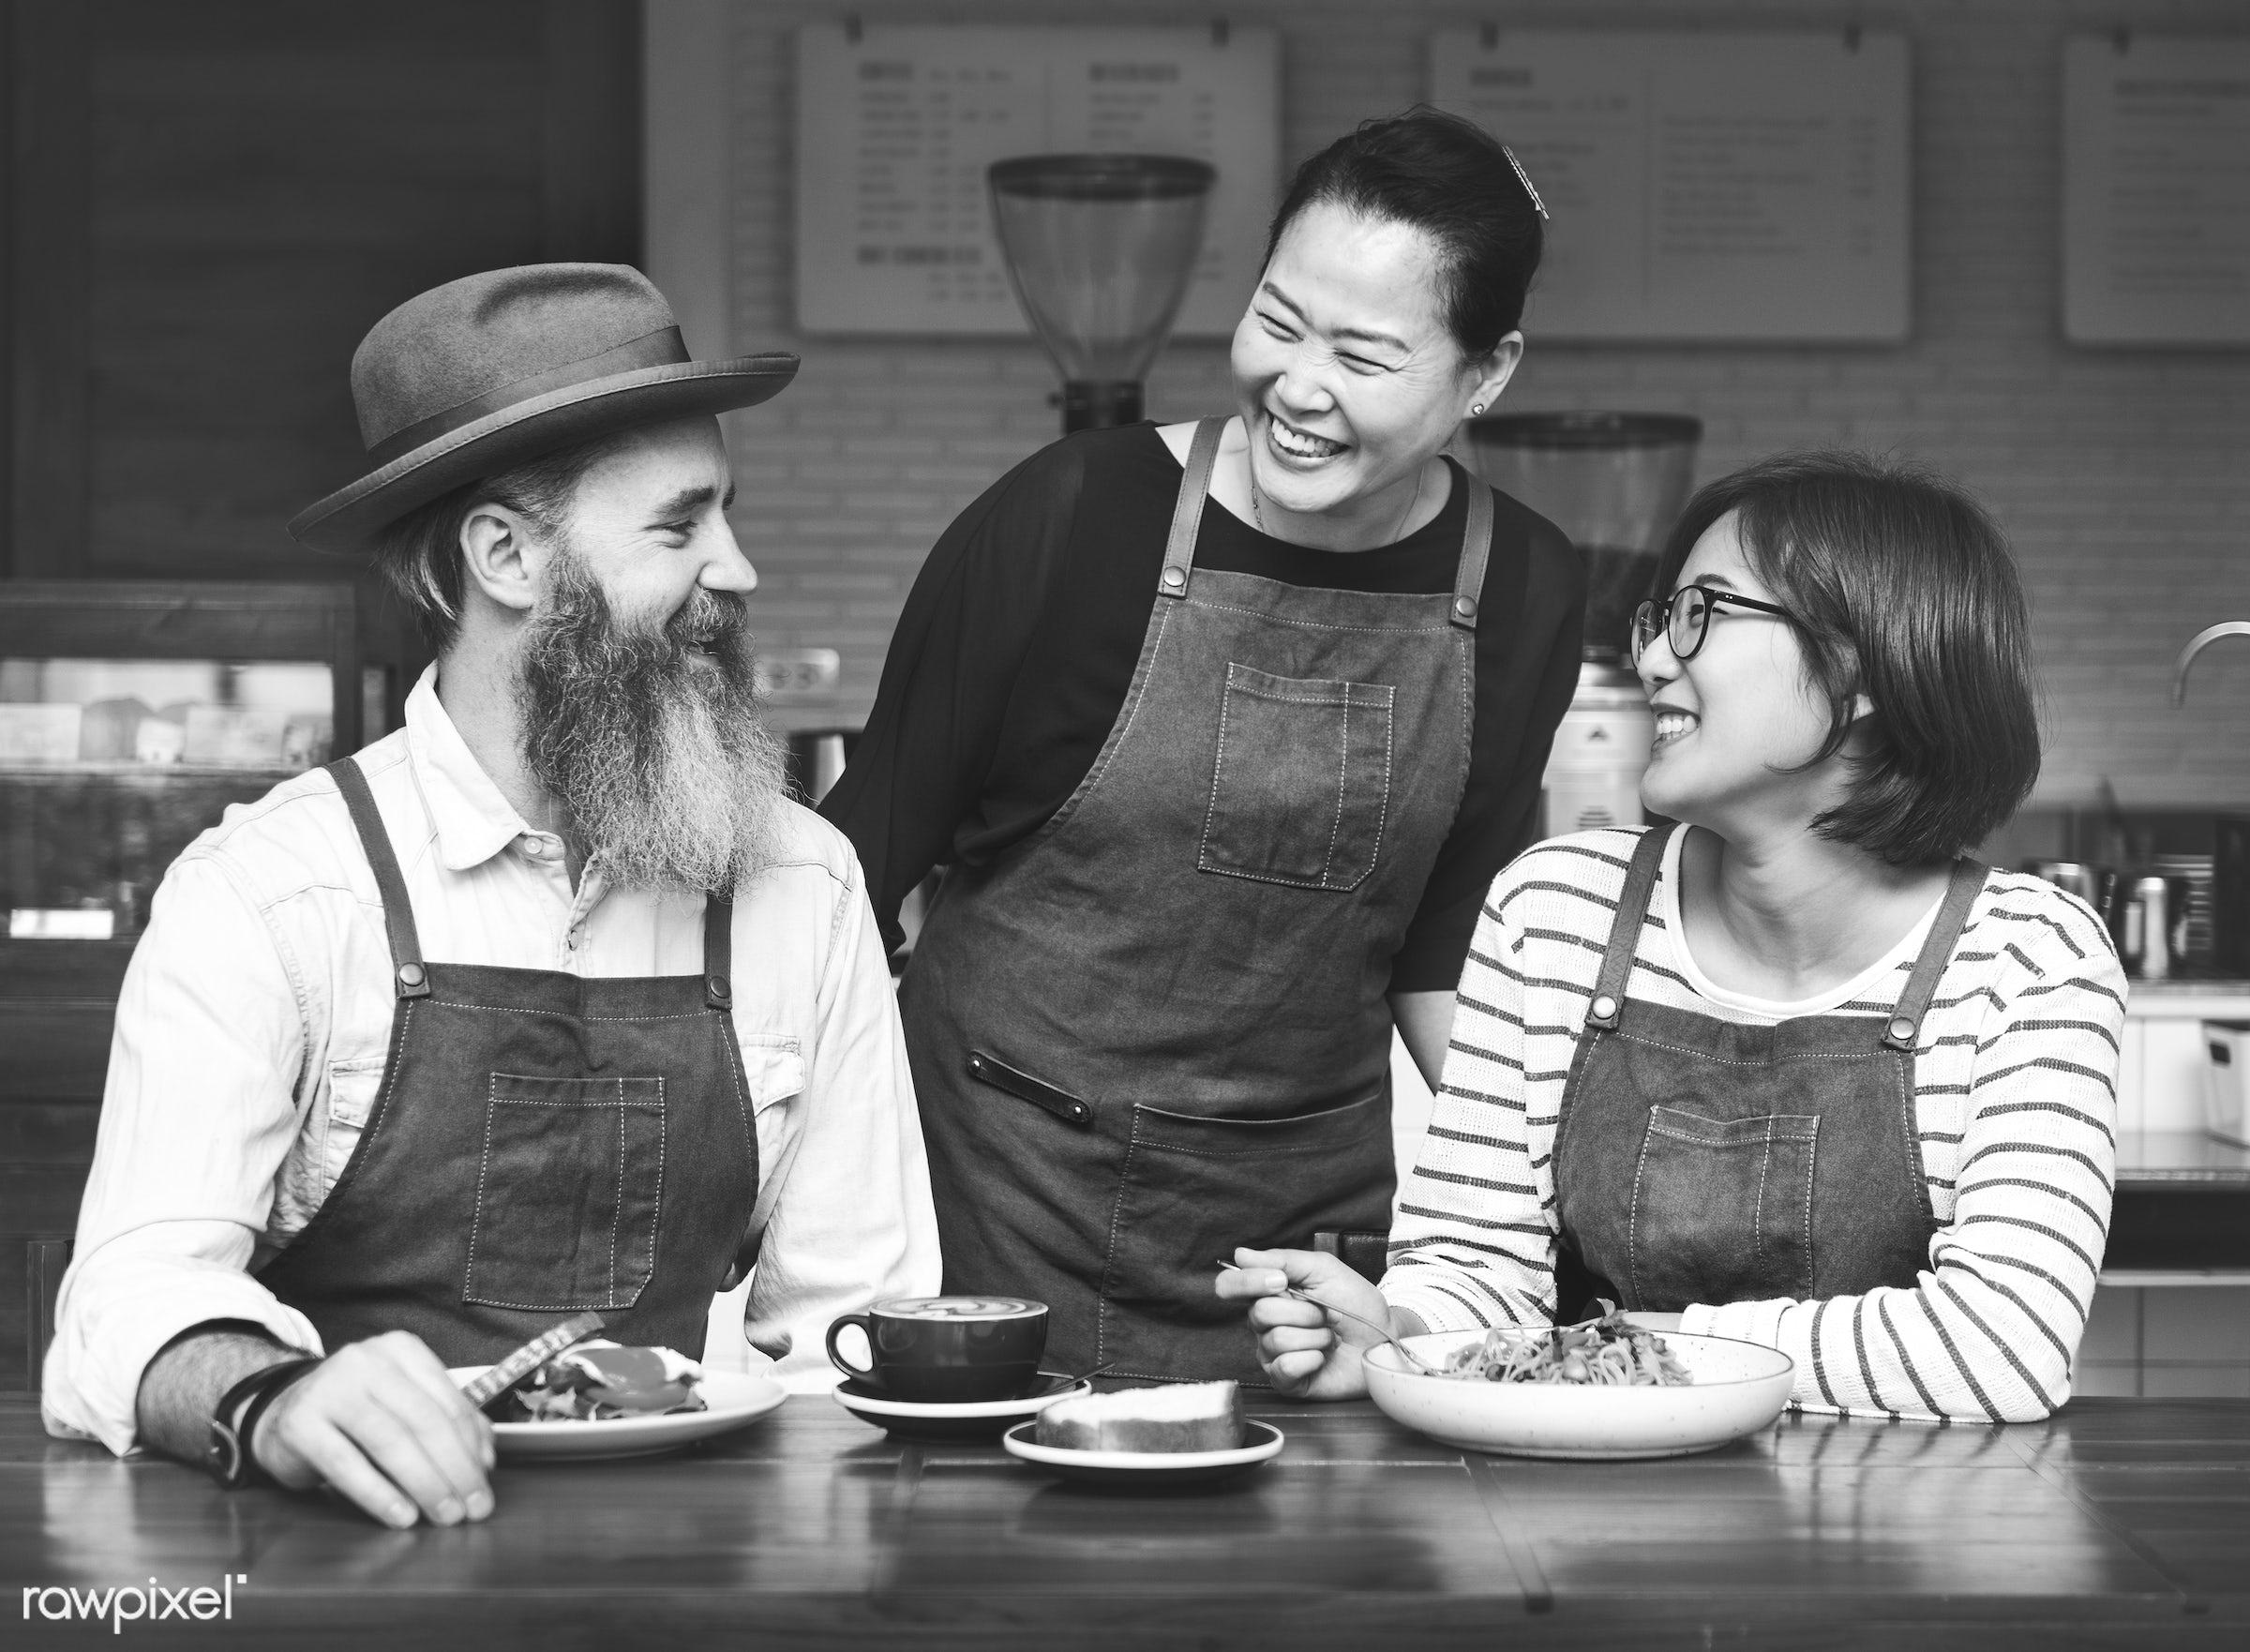 apron, asian ethnicity, beverage, bistro, break, breakfast, brunch, cafe, casual, cheerful, coffee, coffee break, coffee...